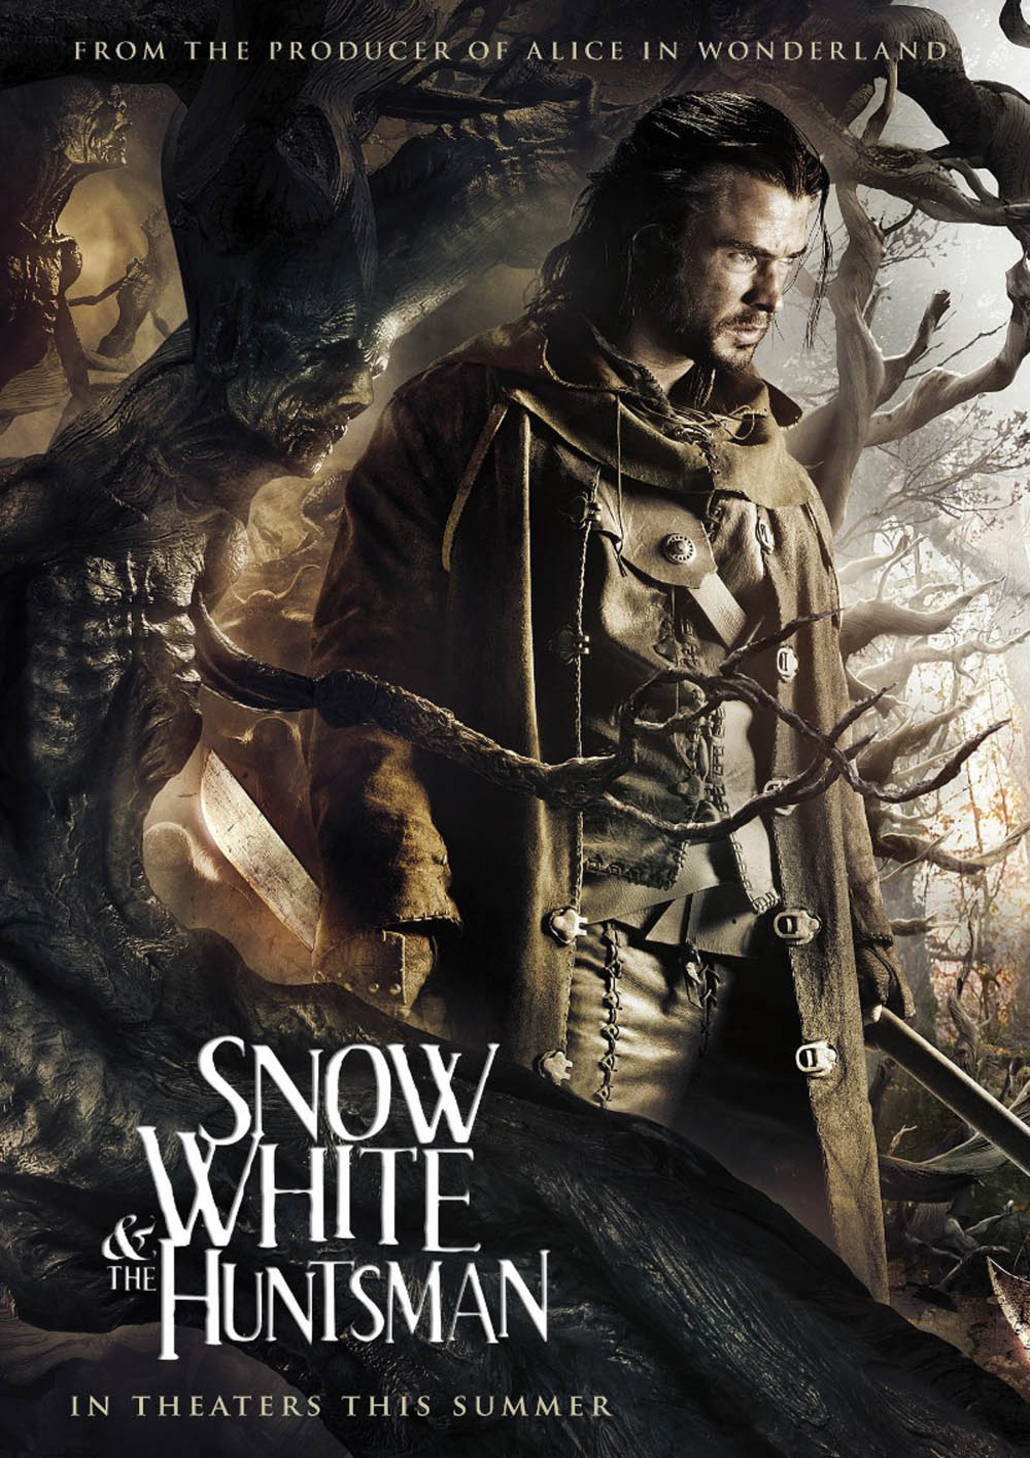 Snow White and the Huntsman - Movie Poster #5 (Original)